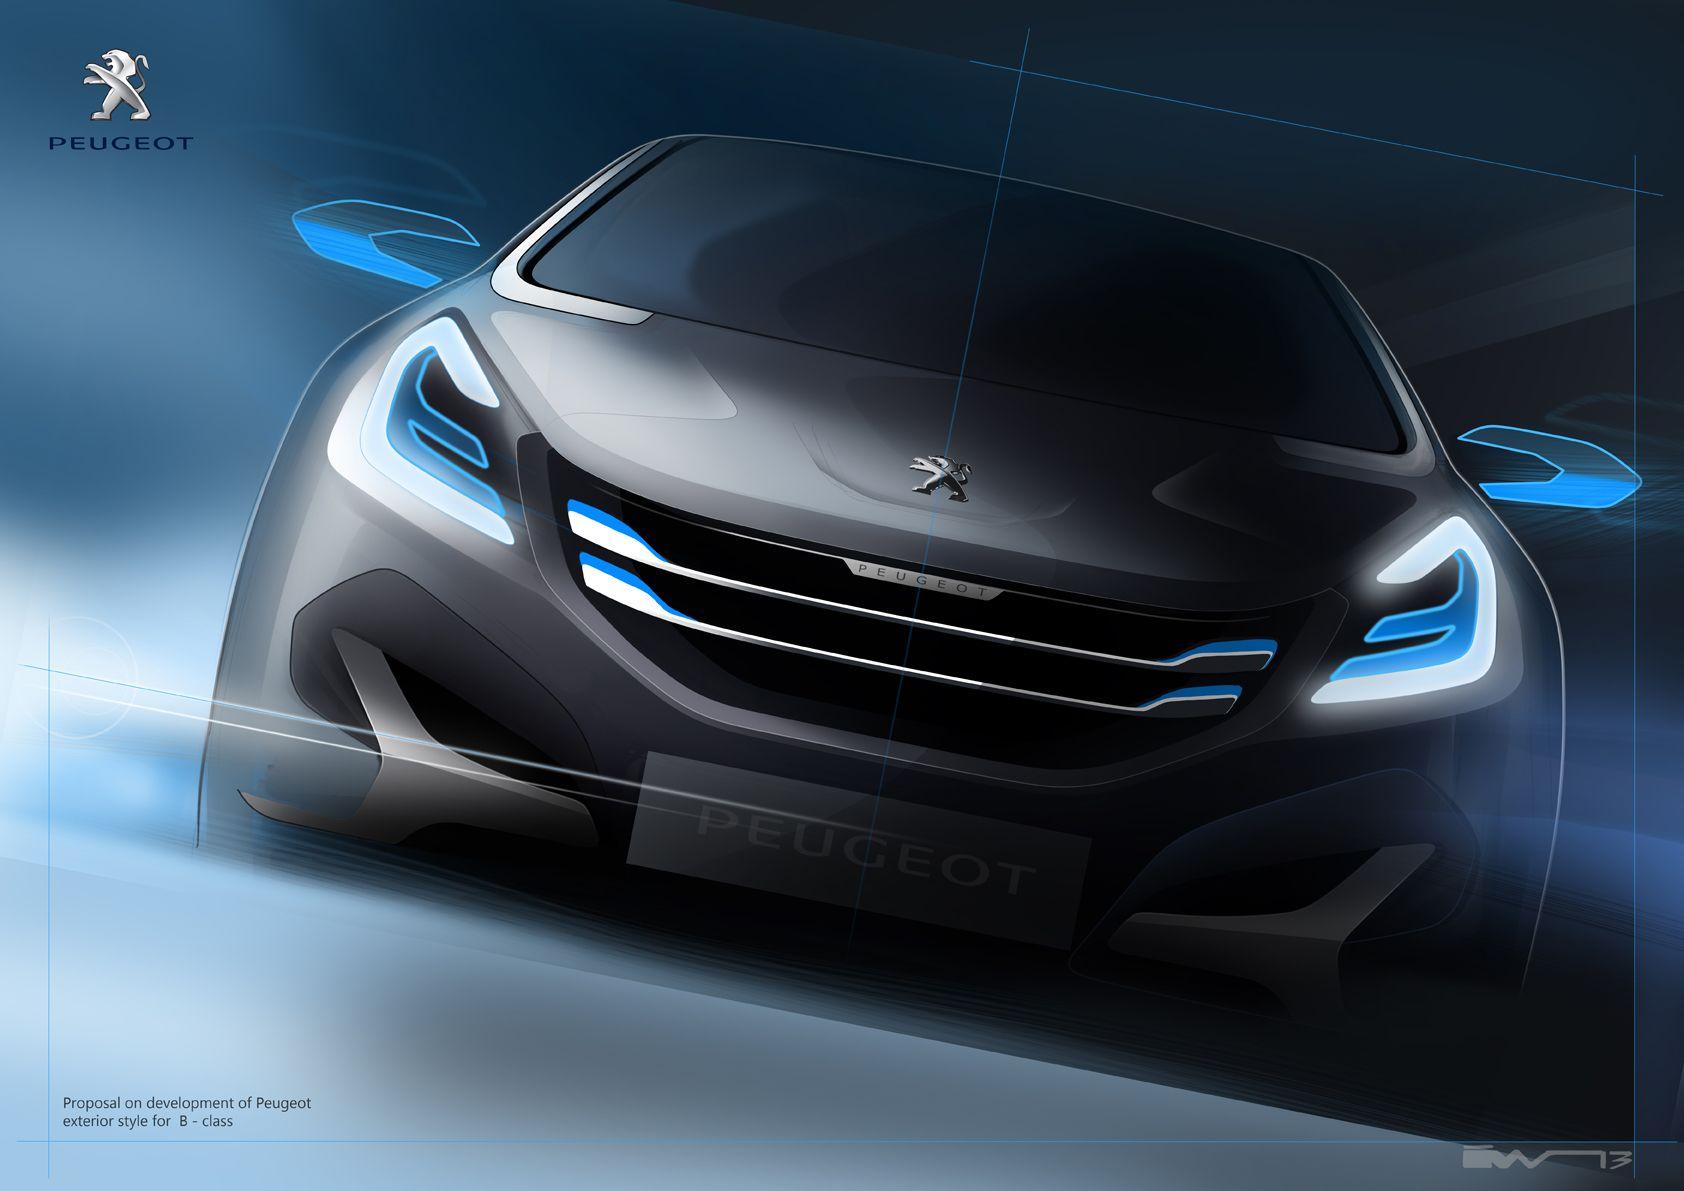 Peugeot proposal sketch